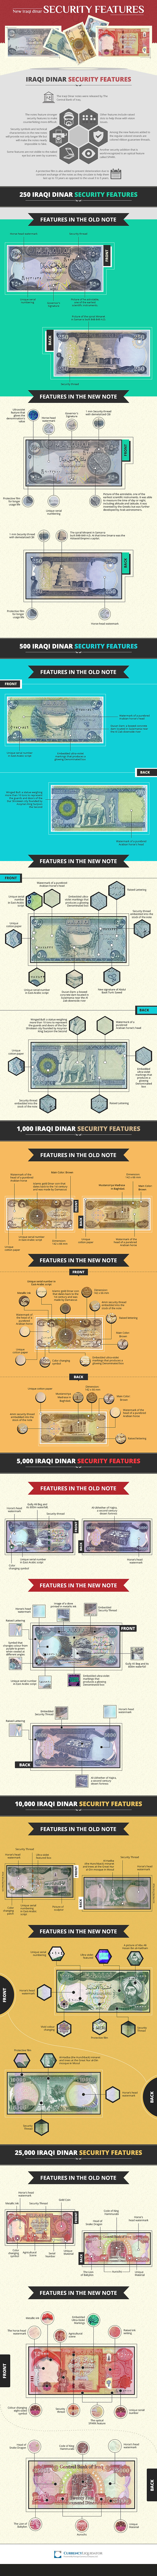 iraqi-dinar-security-features-combined.j